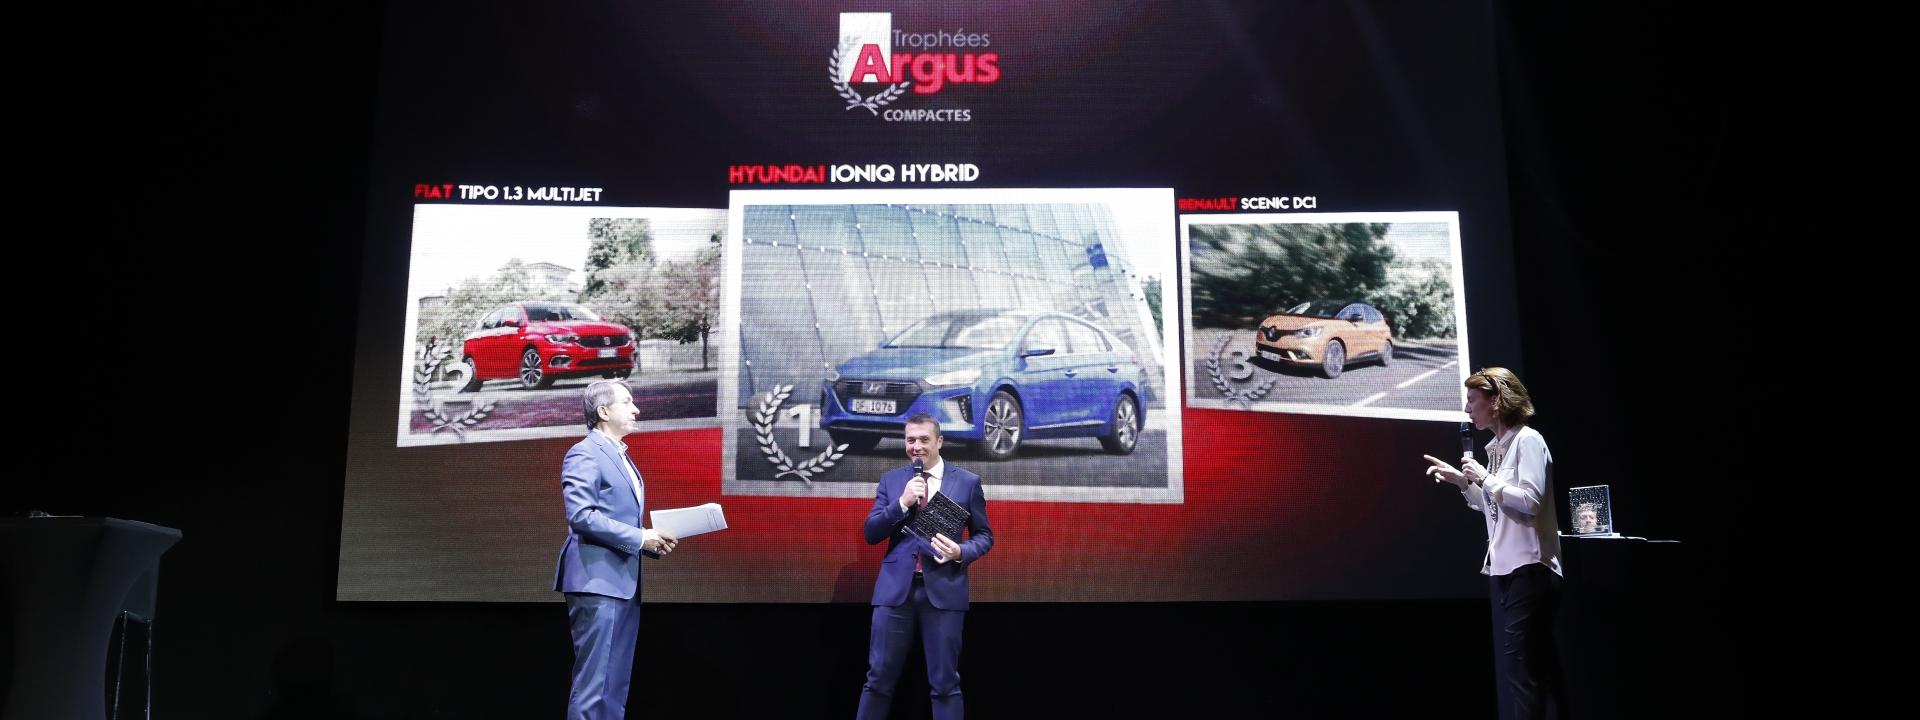 IONIQ Hybrid wins French Car of the Year Award